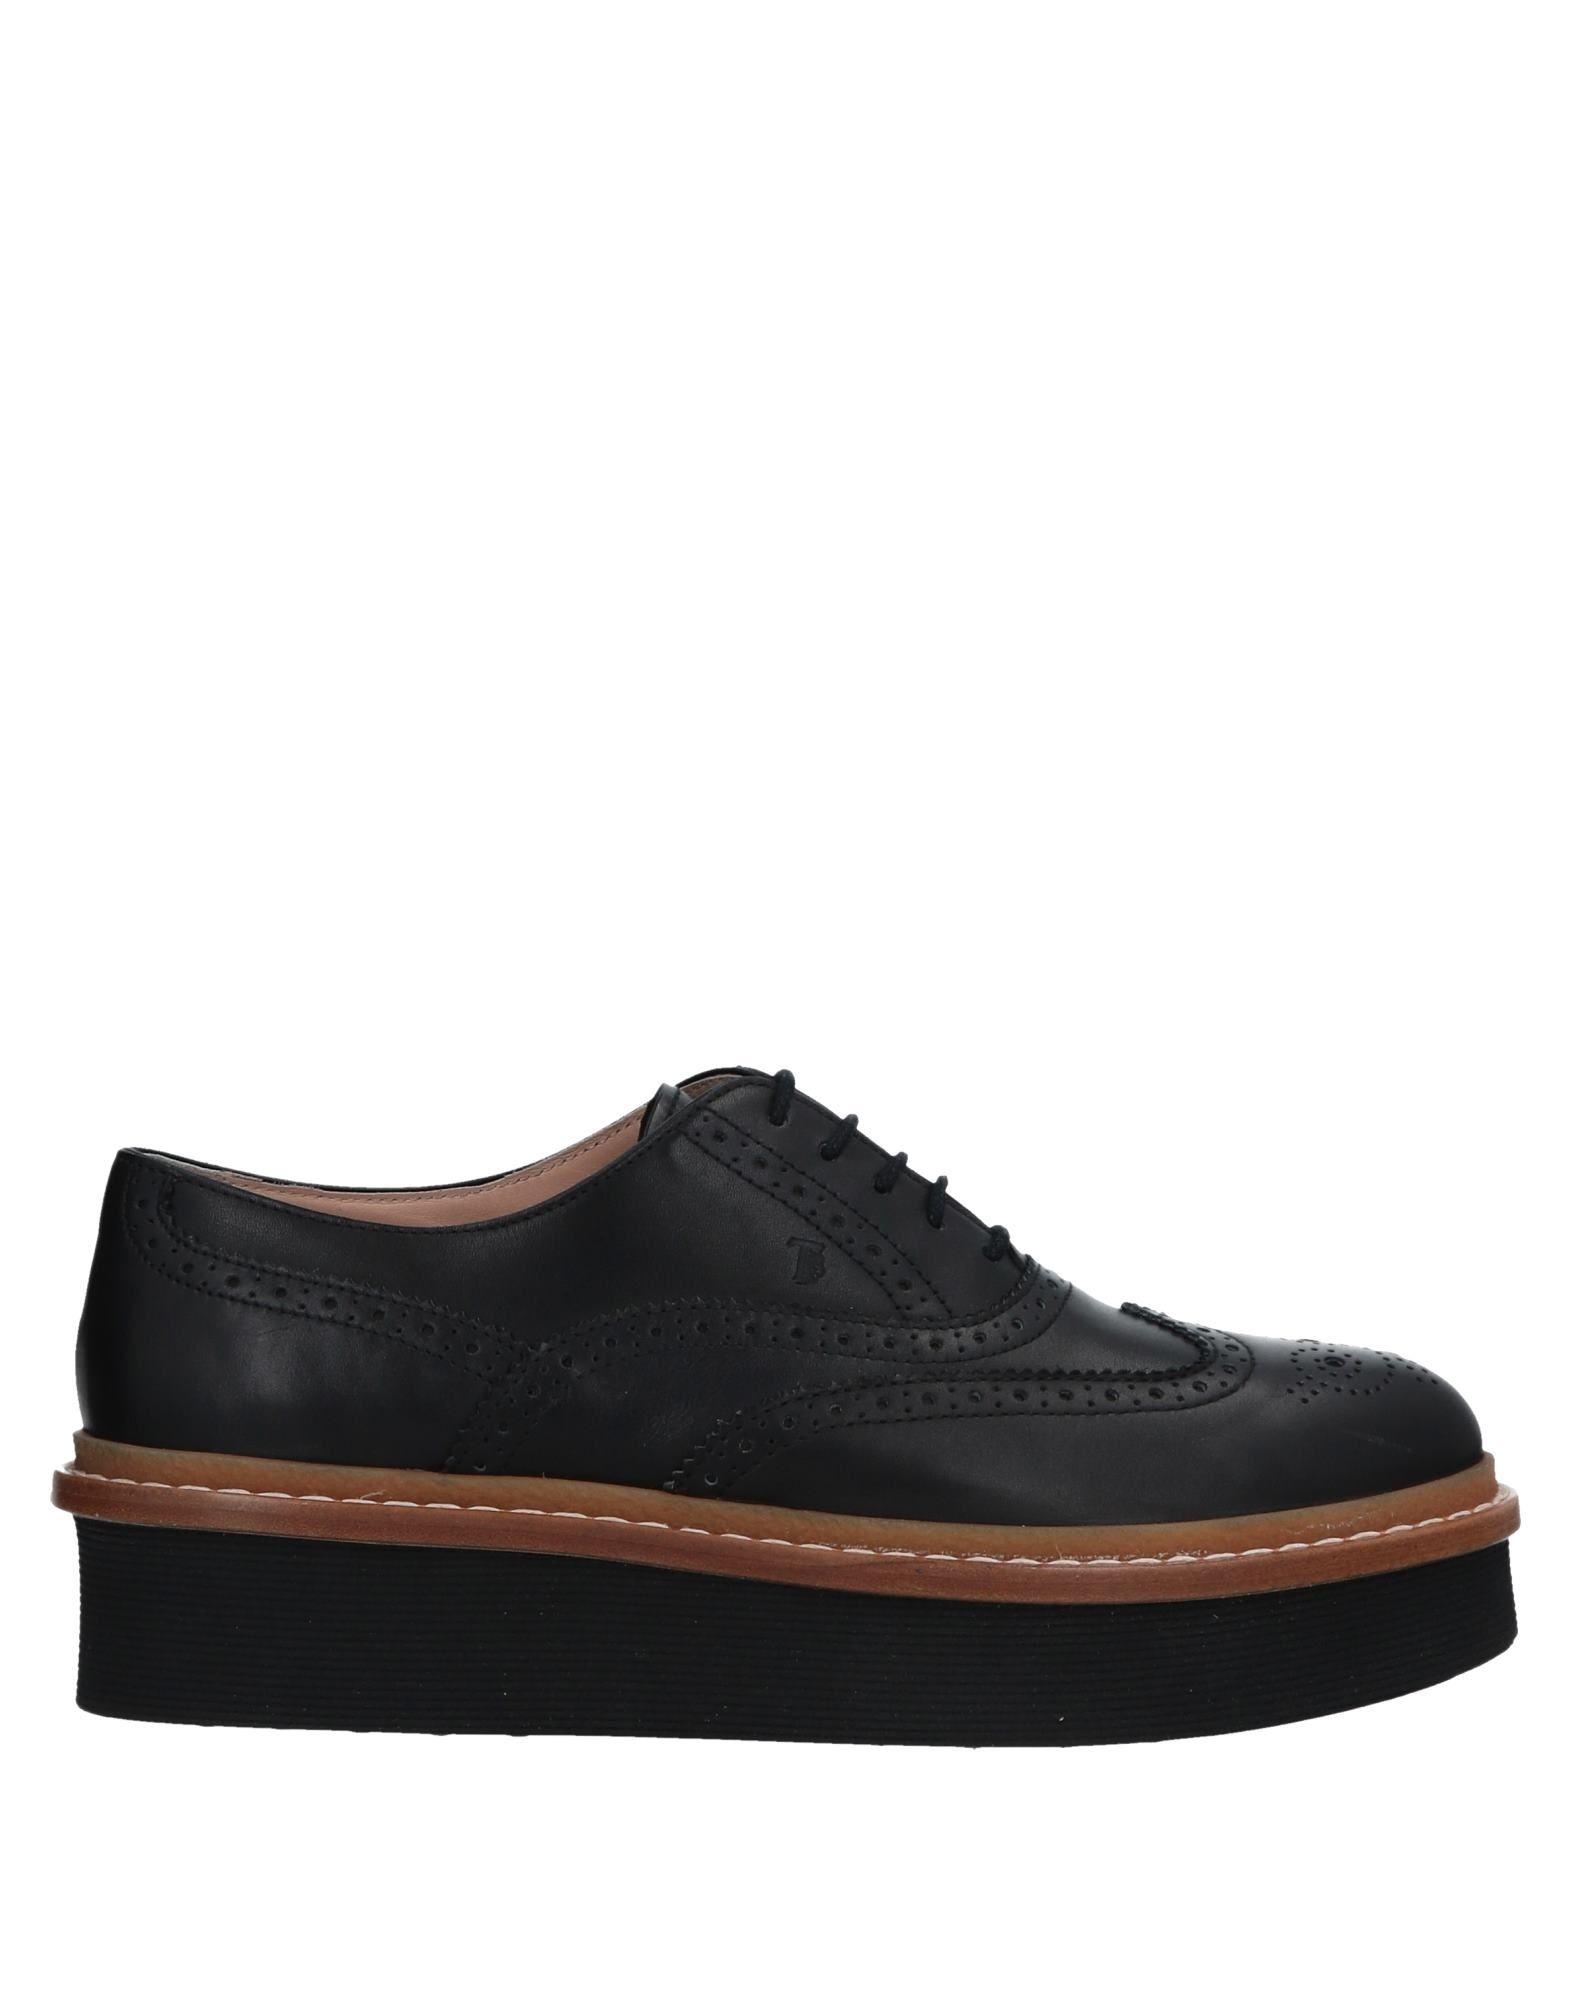 TOD'S Обувь на шнурках первый внутри обувь обувь обувь обувь обувь обувь обувь обувь обувь 8a2549 мужская армия green 40 метров